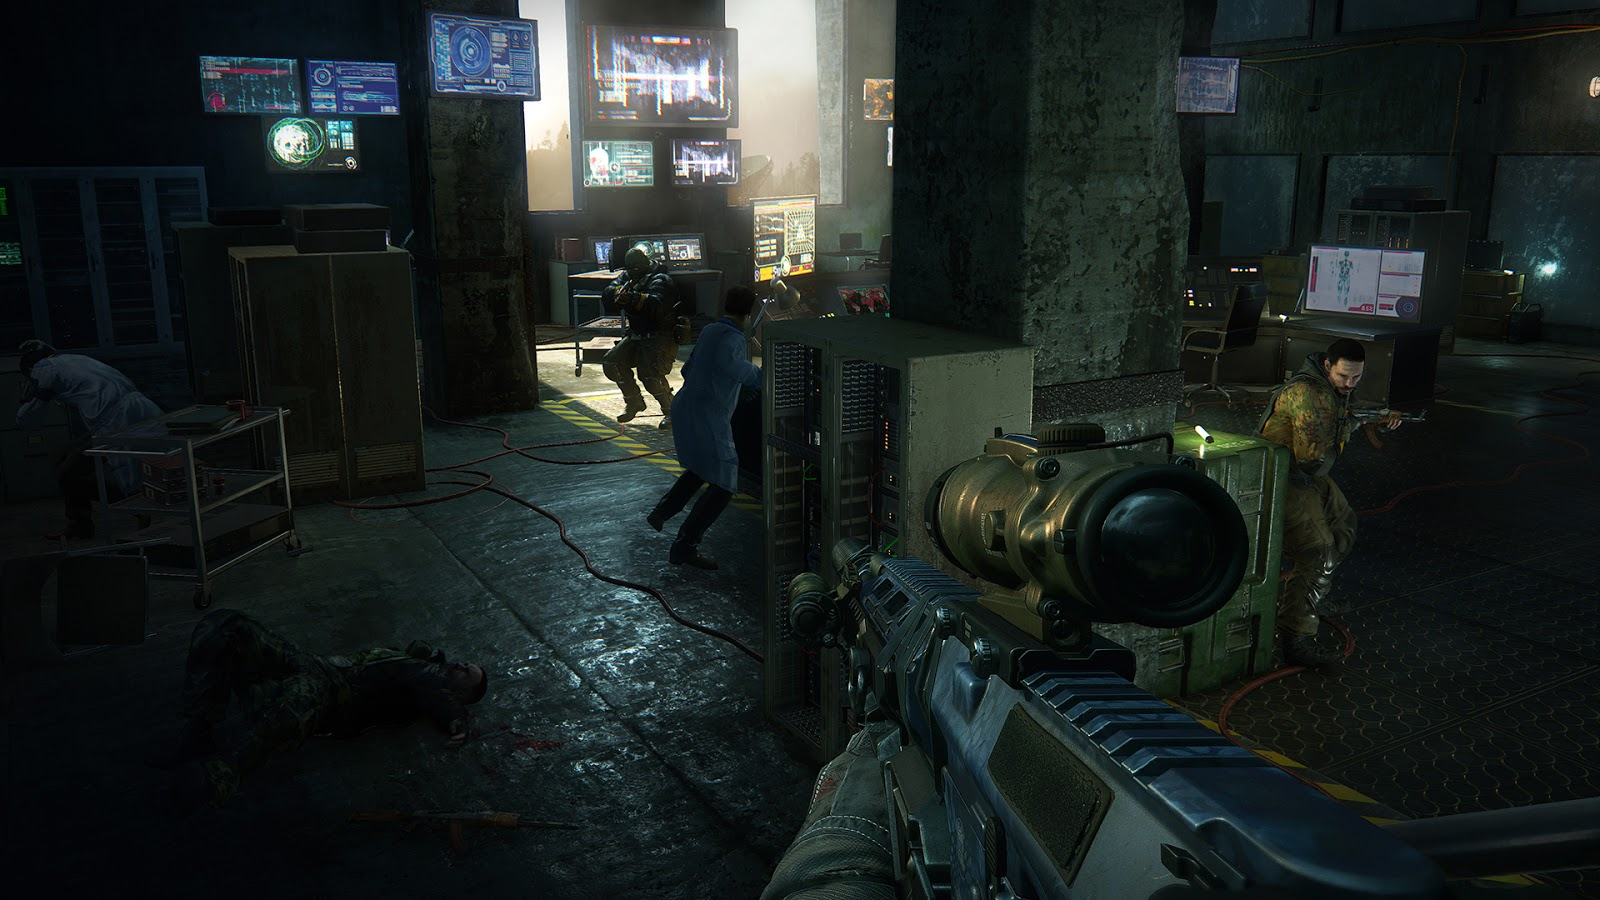 Sniper Ghost Warrior 3 ESPAÑOL PC (CPY) + Update v1.08 (PLAZA) + REPACK 10 DVD5 (JPW) 3